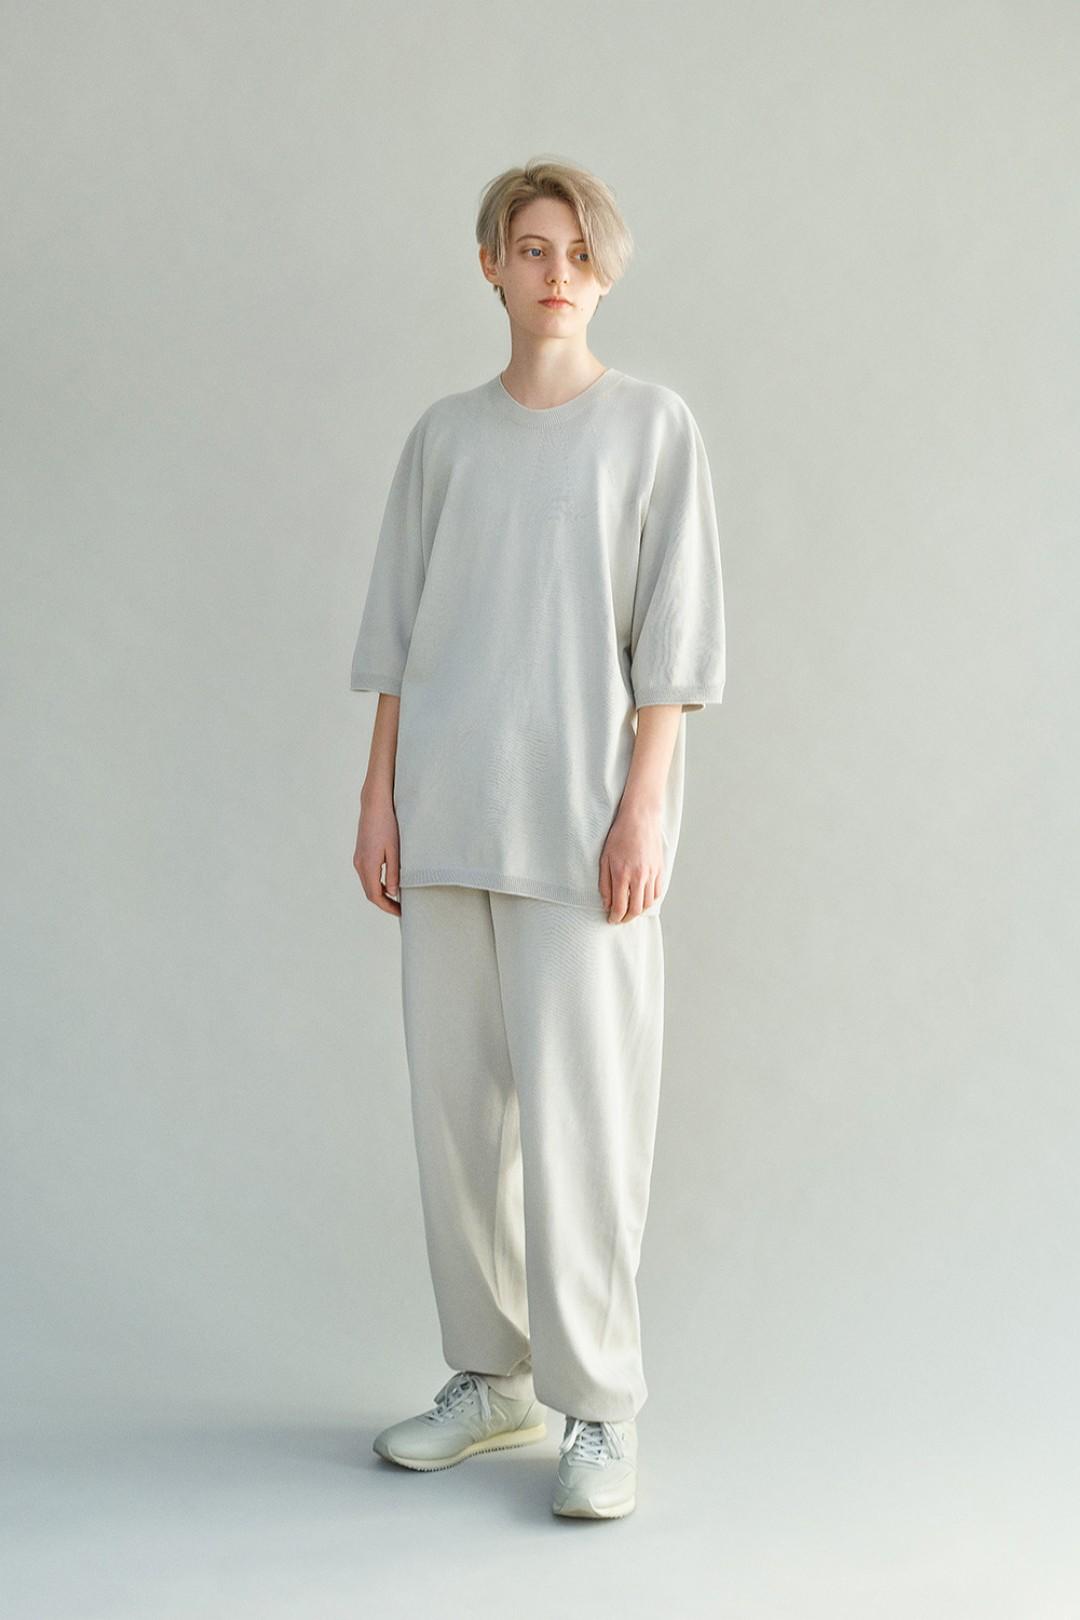 auralee new balance comp100 sneaker apparel collaboration spring summer 2020